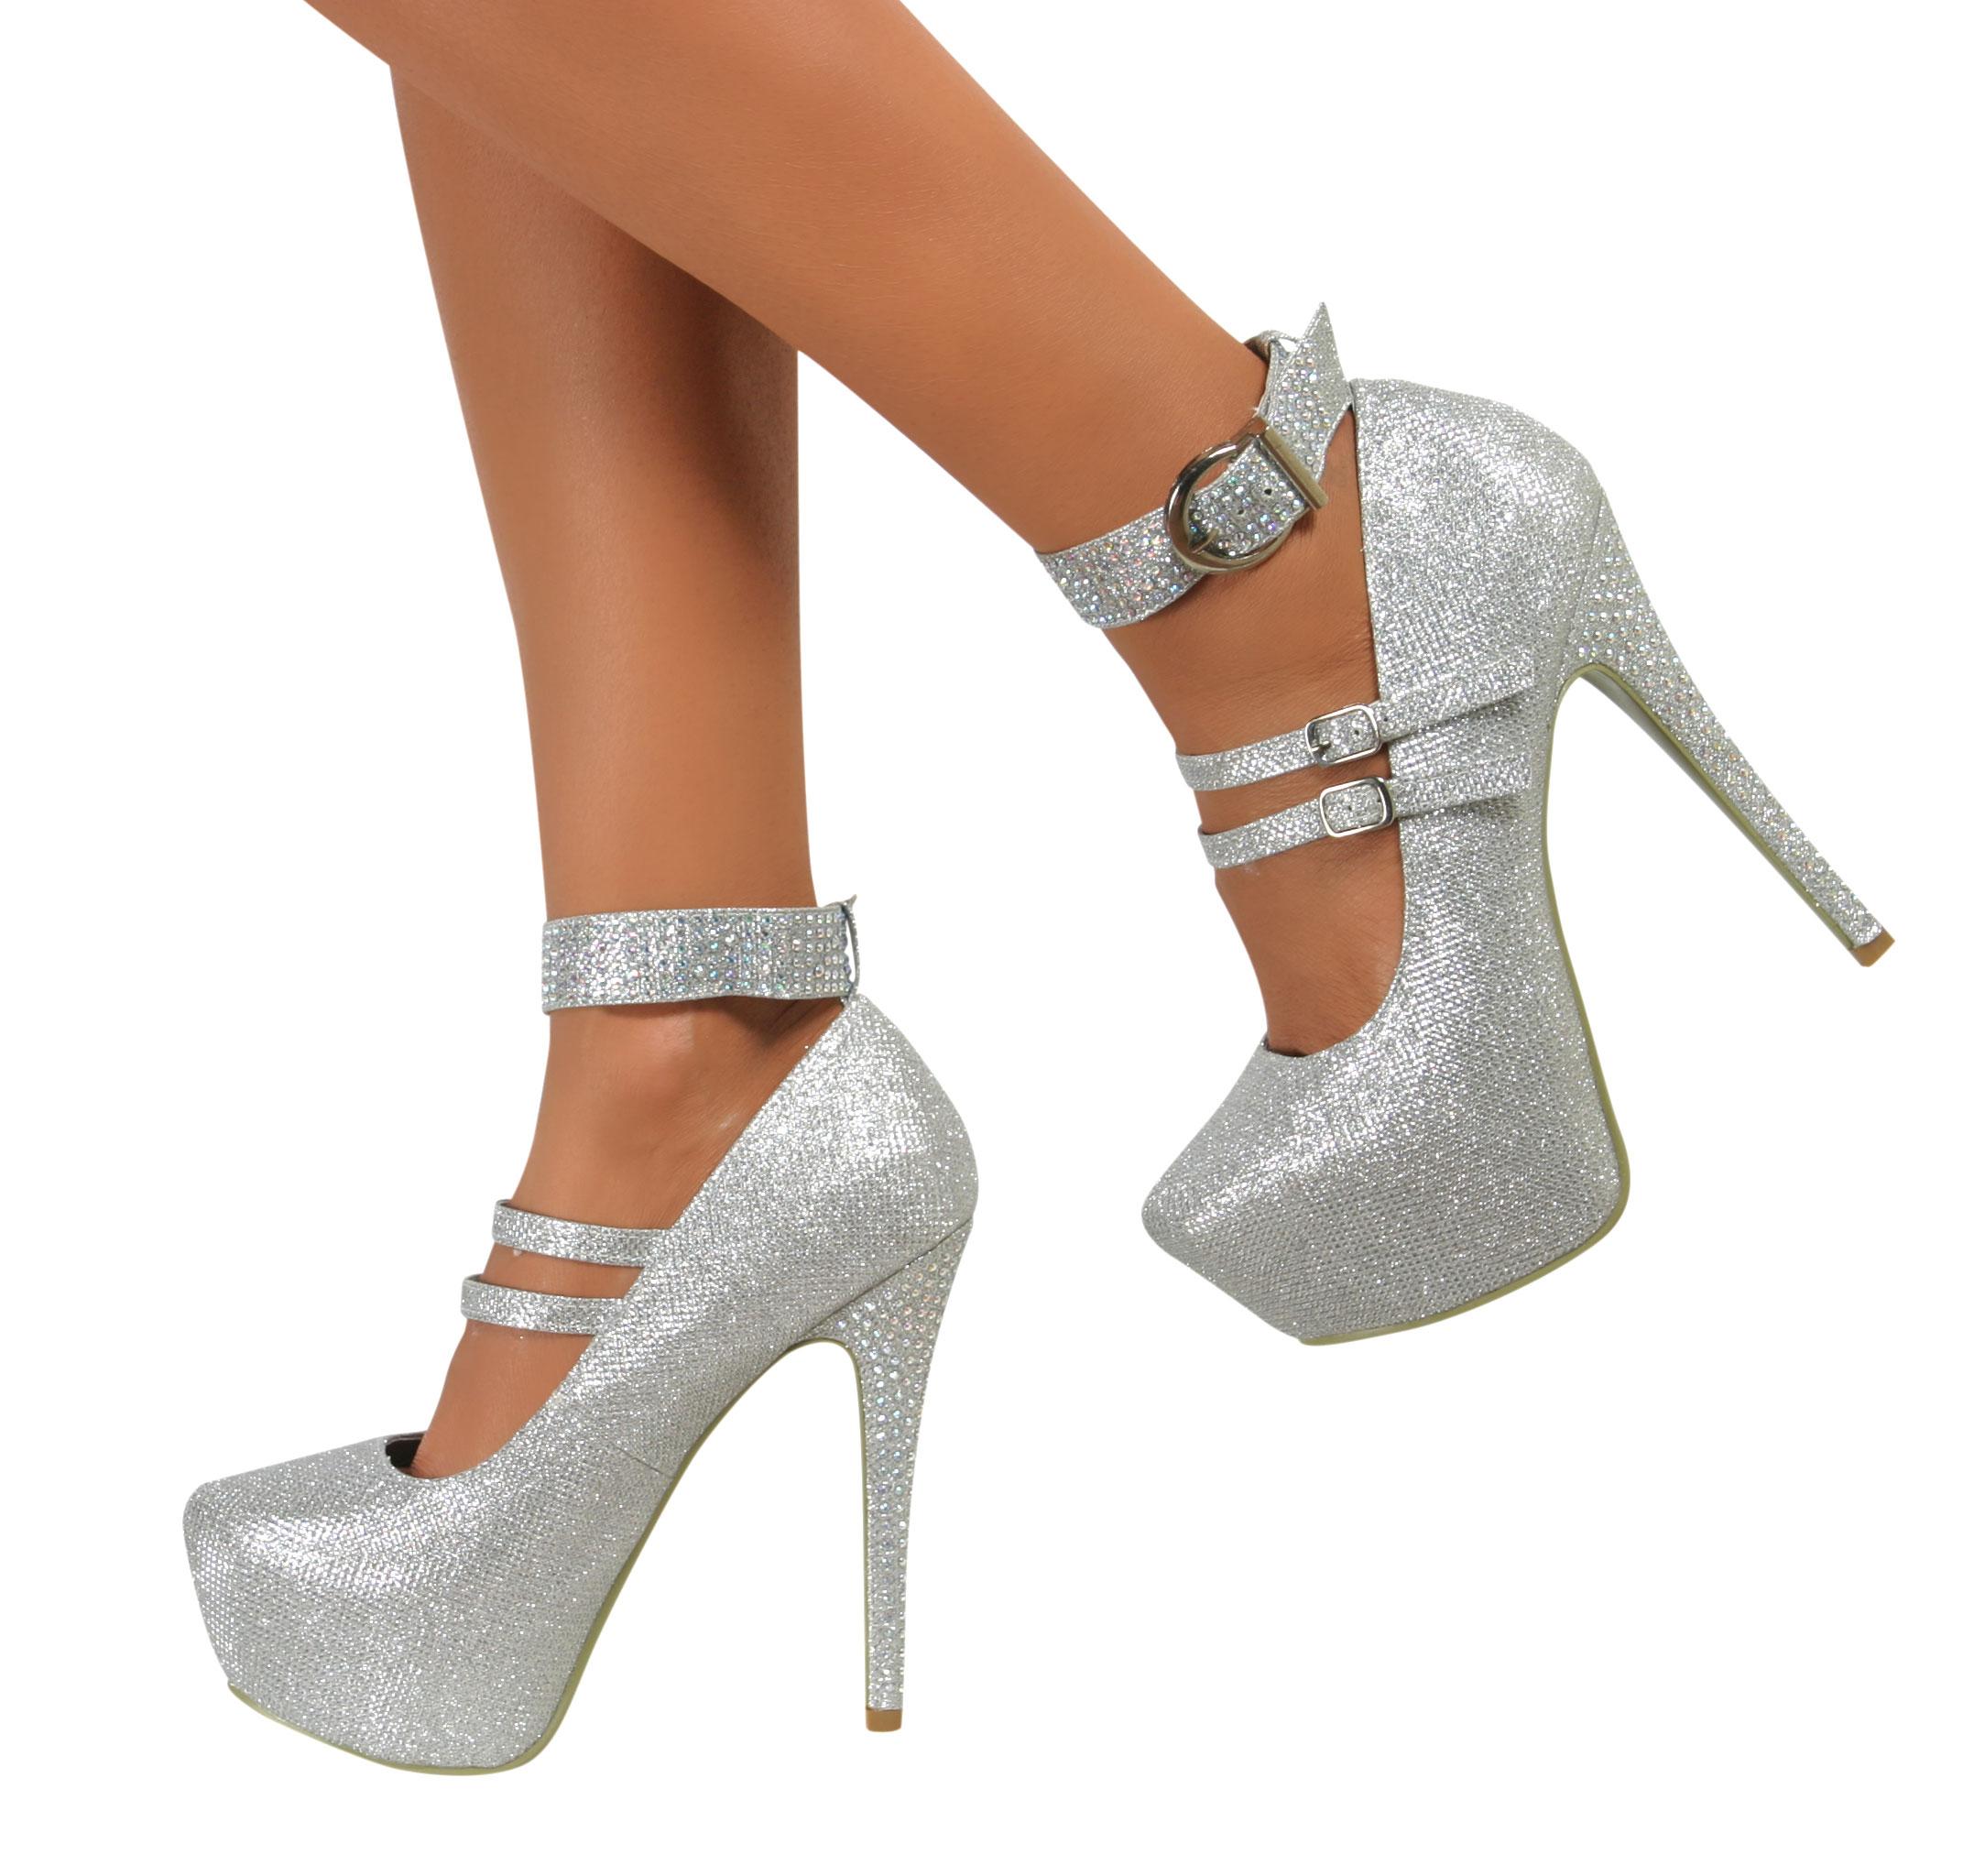 Silver Glitter Pumps 2 Inch Heel